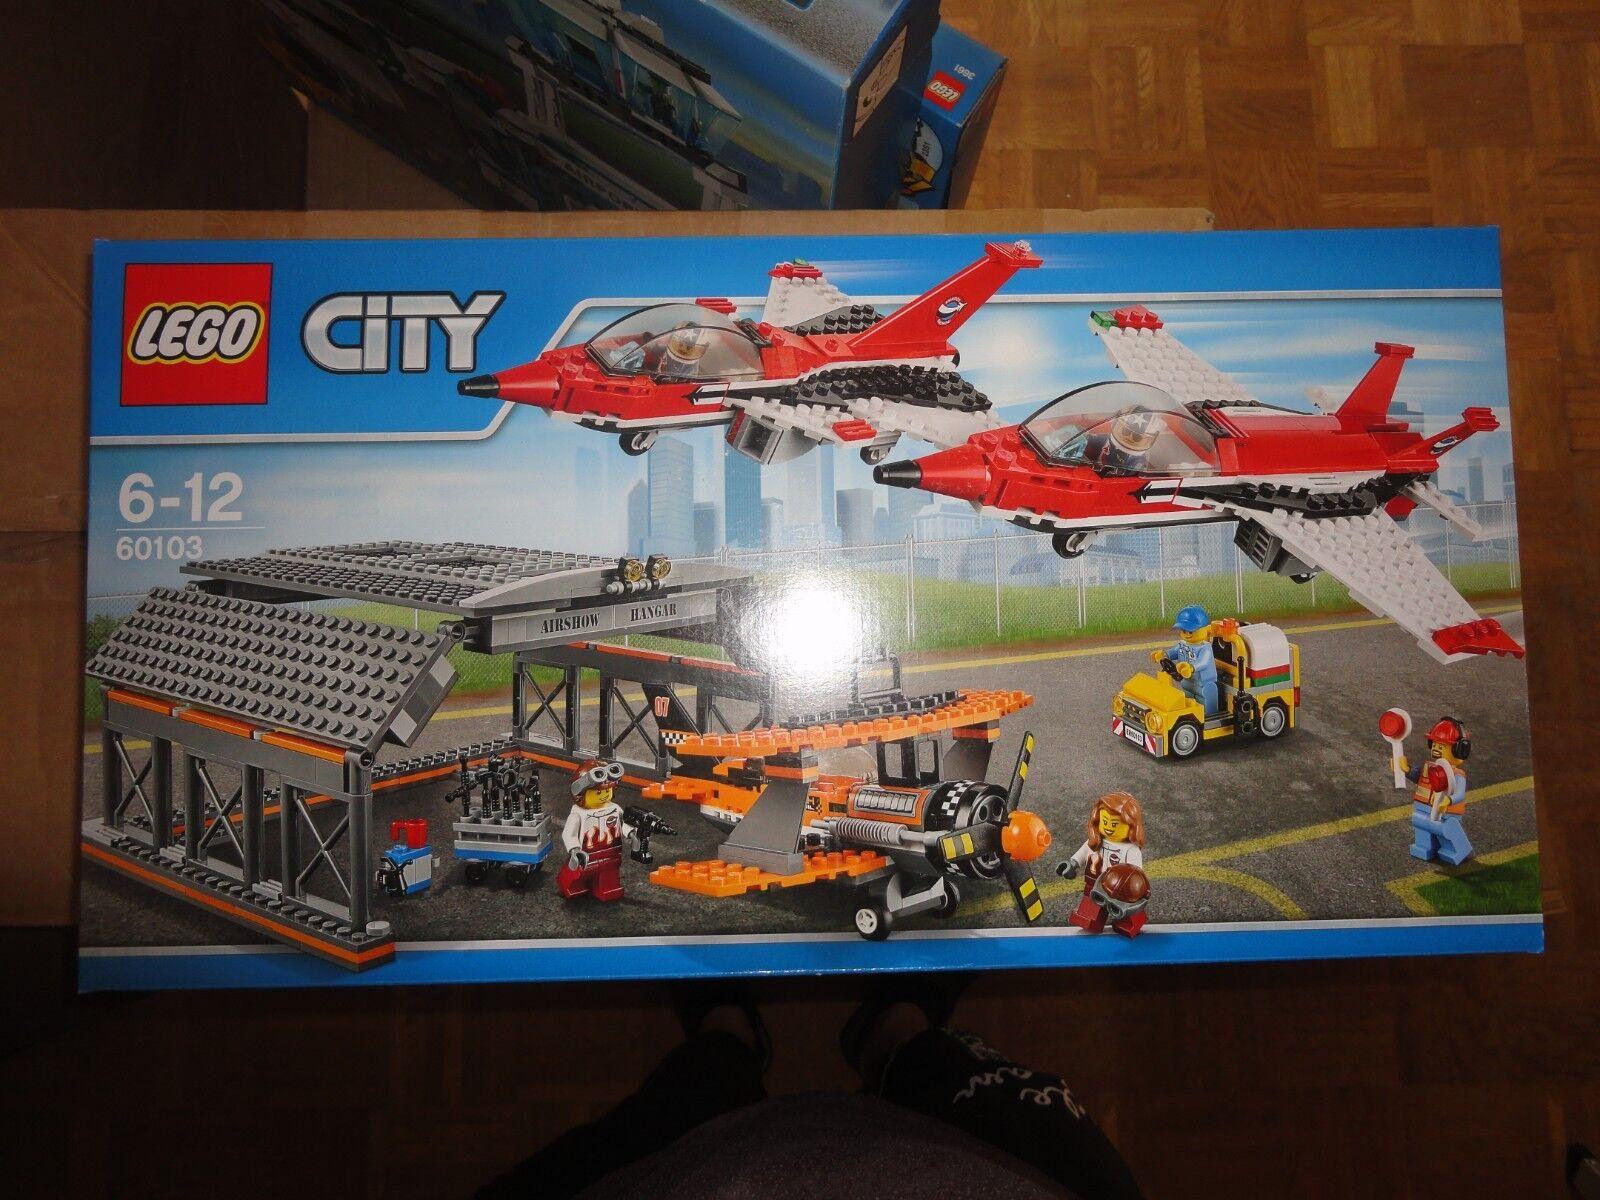 LEGO City Airport 60103-Airport Air  Show NOUVEAU & NEUF dans sa boîte  100% garantie de prix